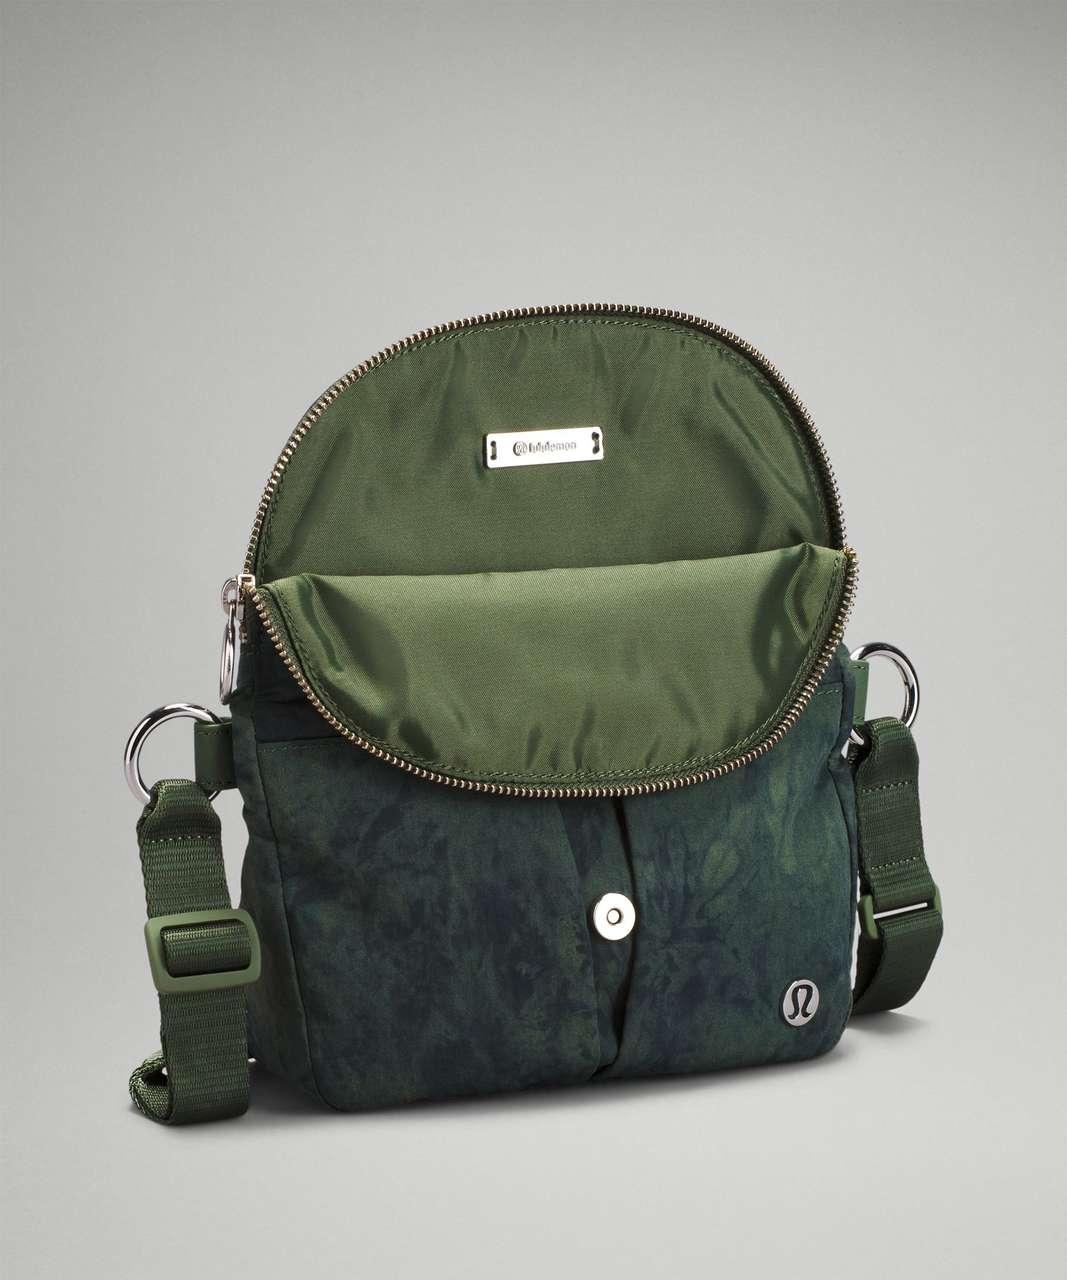 Lululemon All Night Festival Bag *Micro - Aquila Green Twill Multi